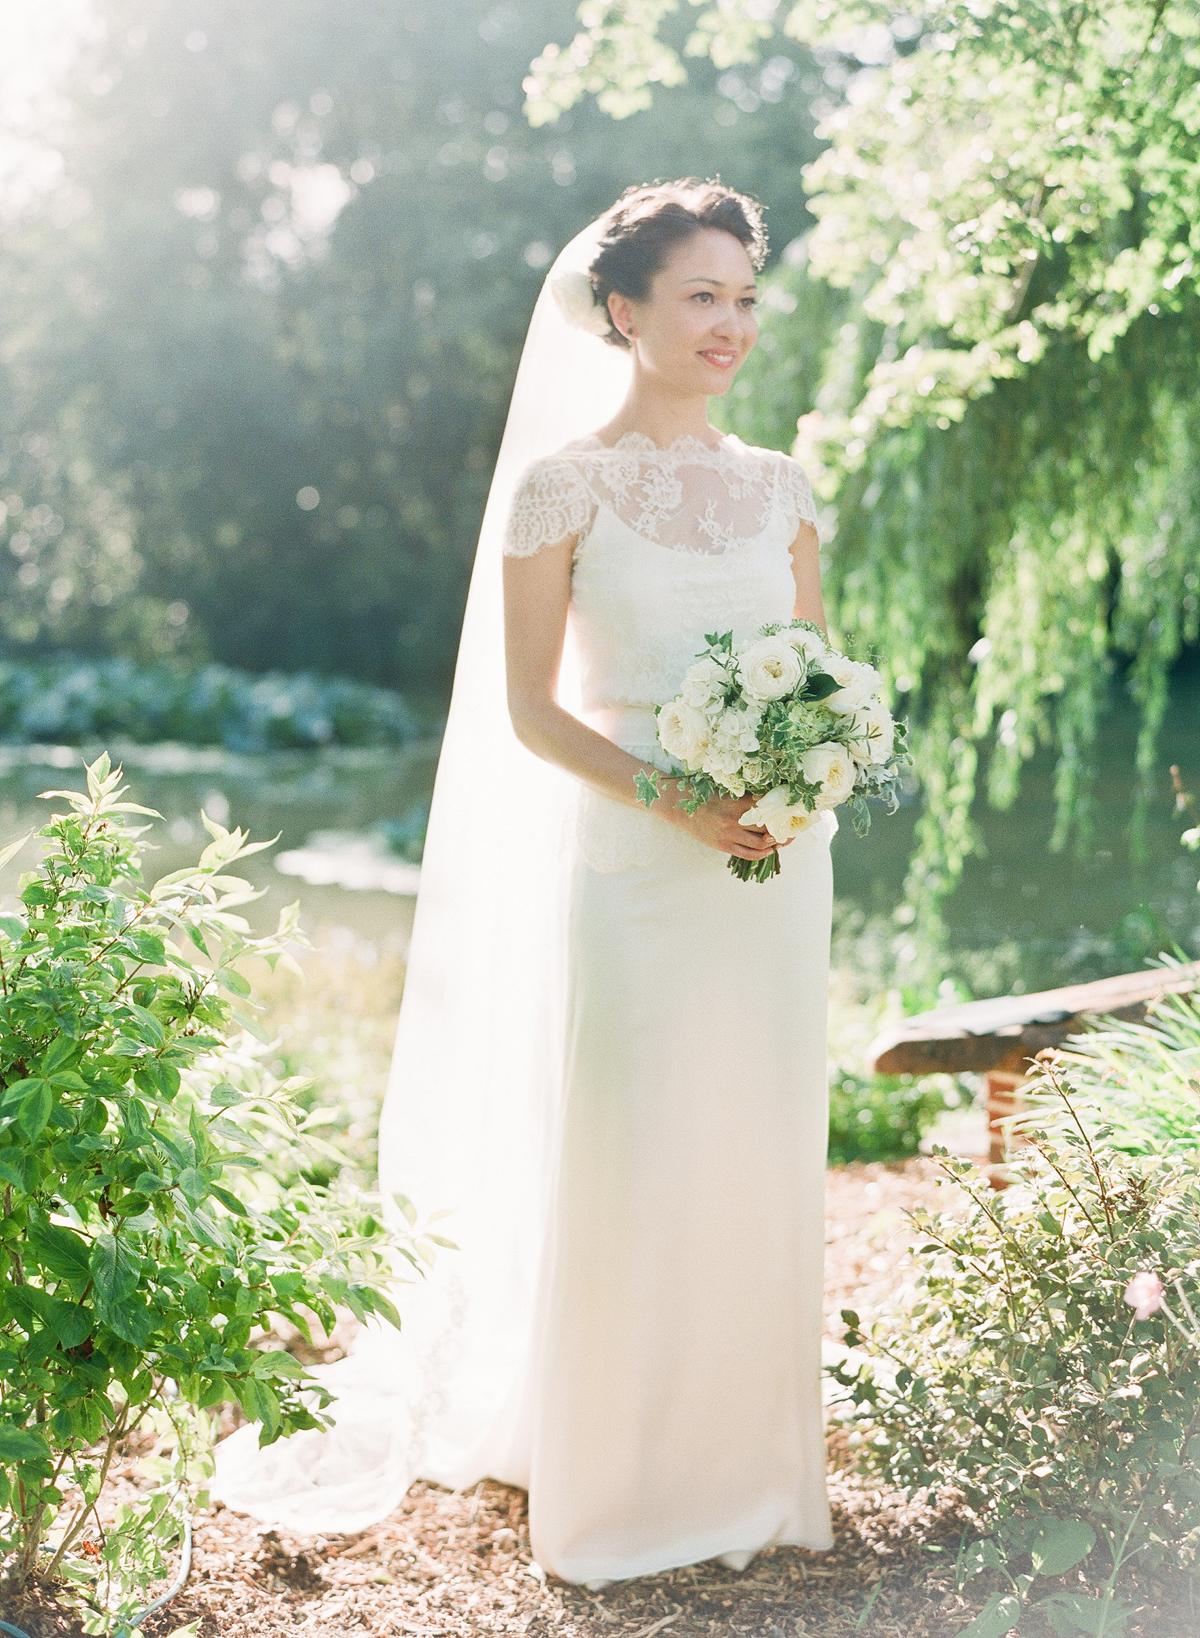 Belle & Bunty - Made To Order Wedding Dresses for Modern, Fashion ...